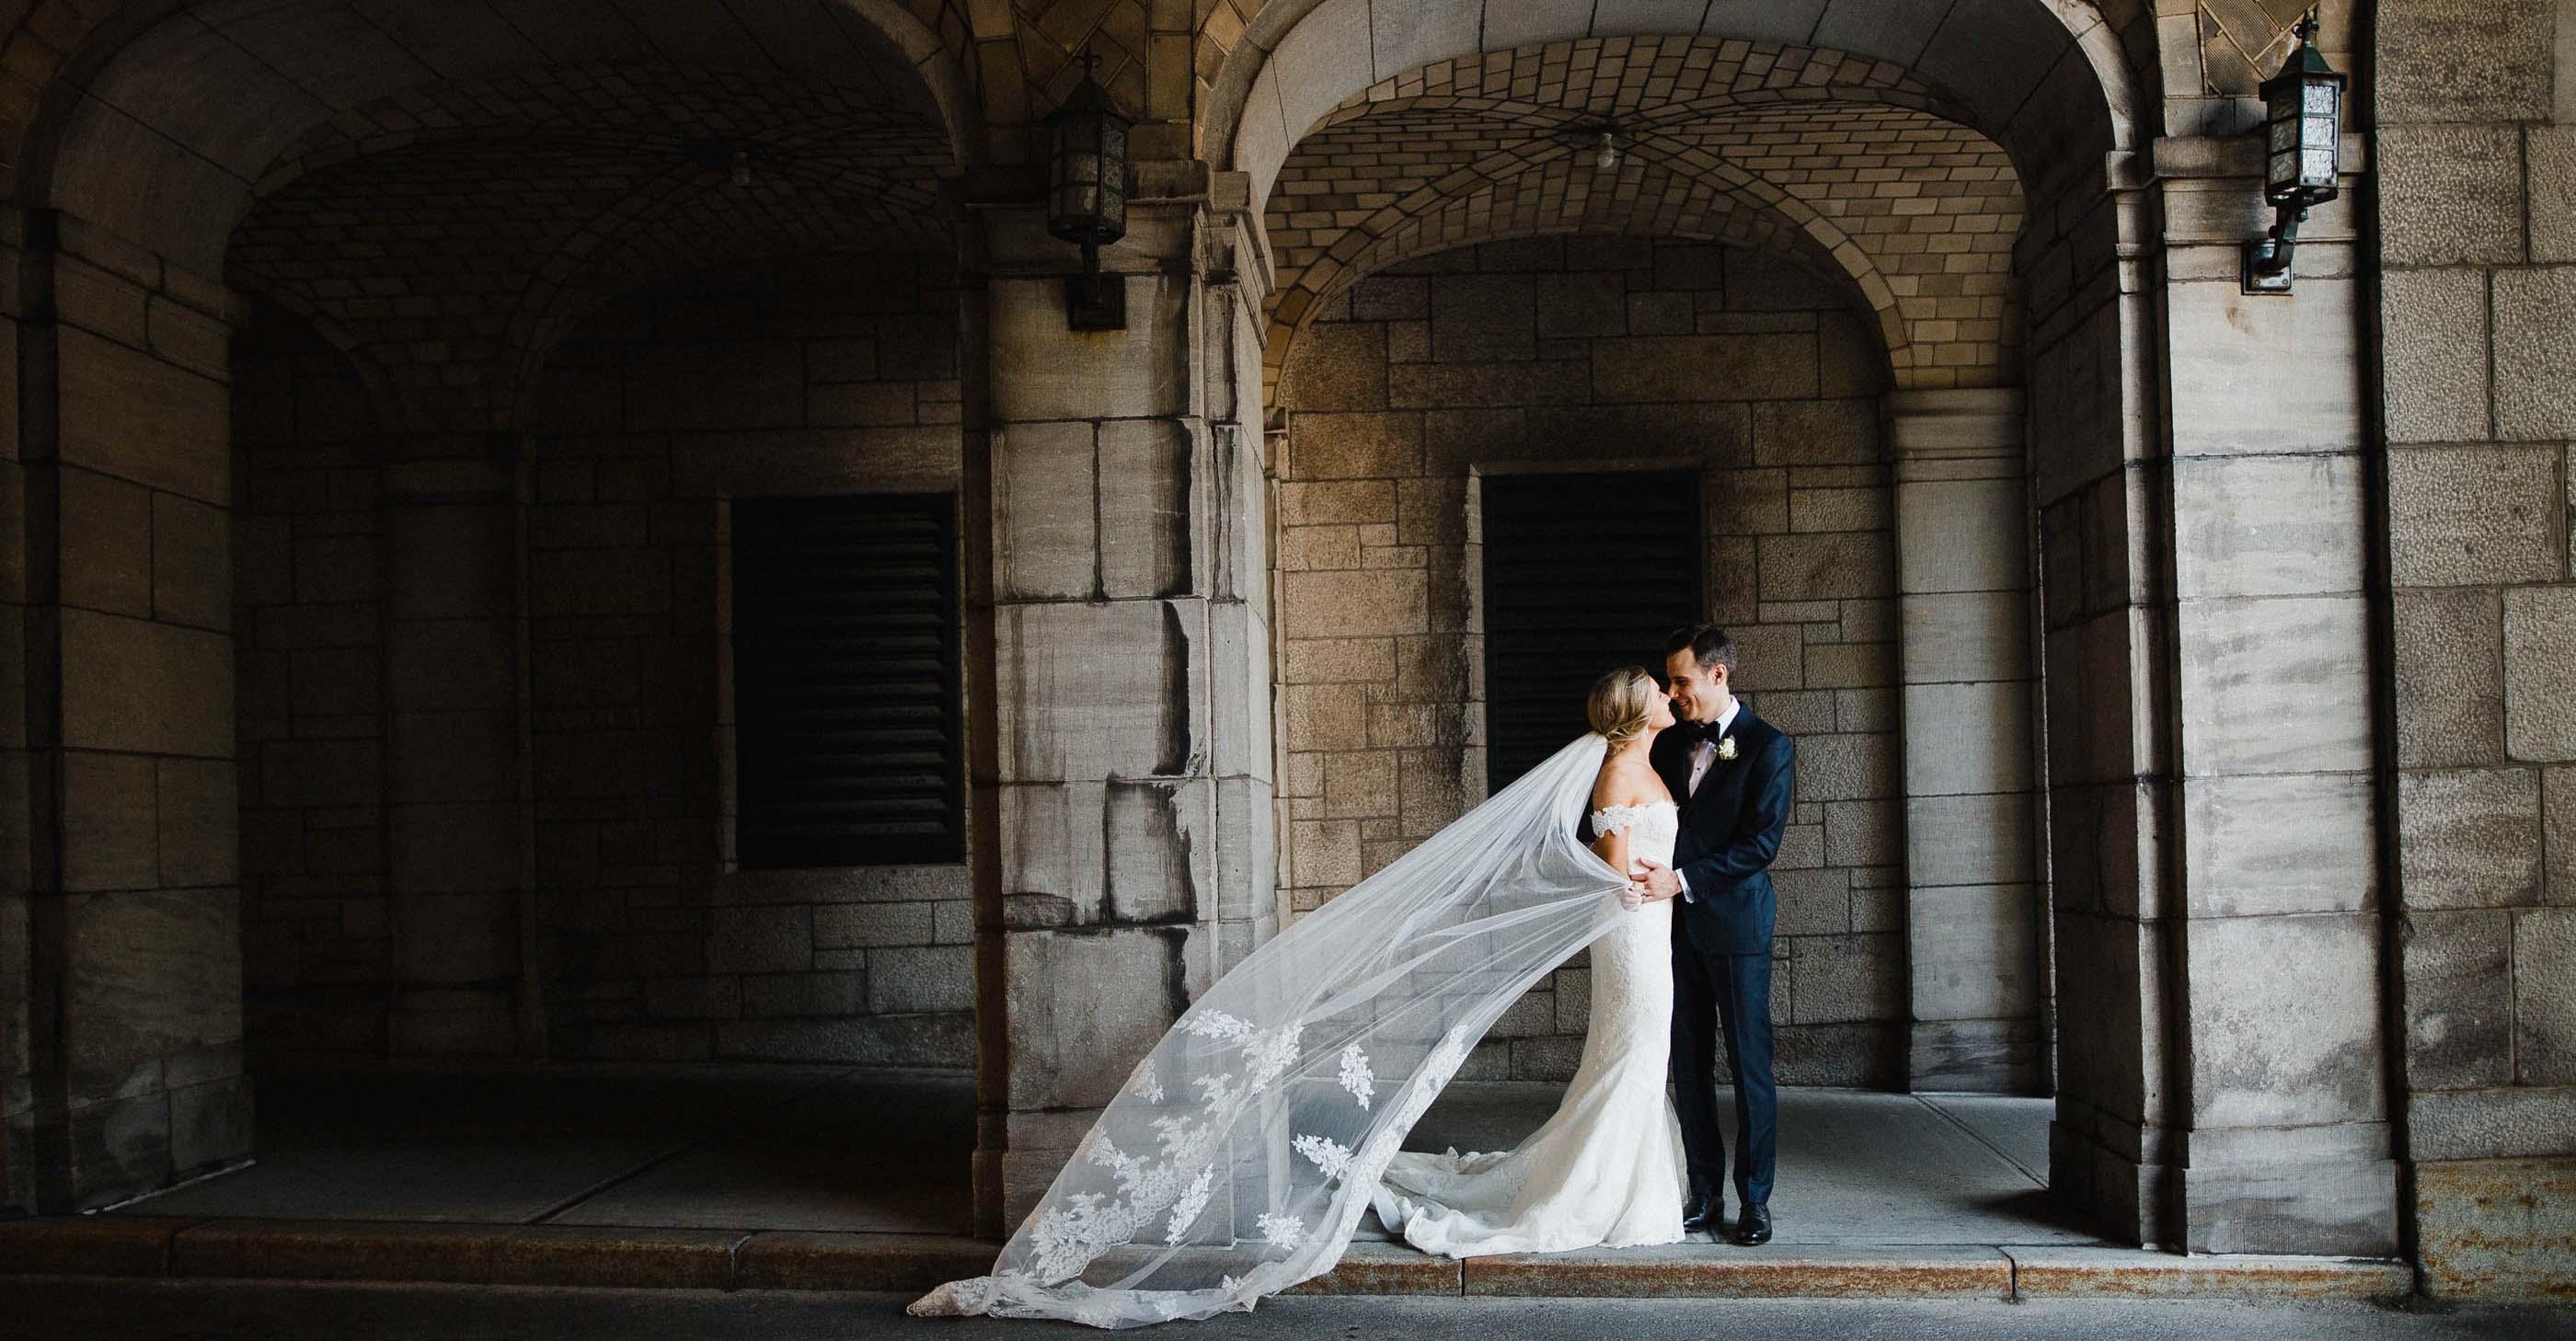 photographe-de-mariage-montreal-5